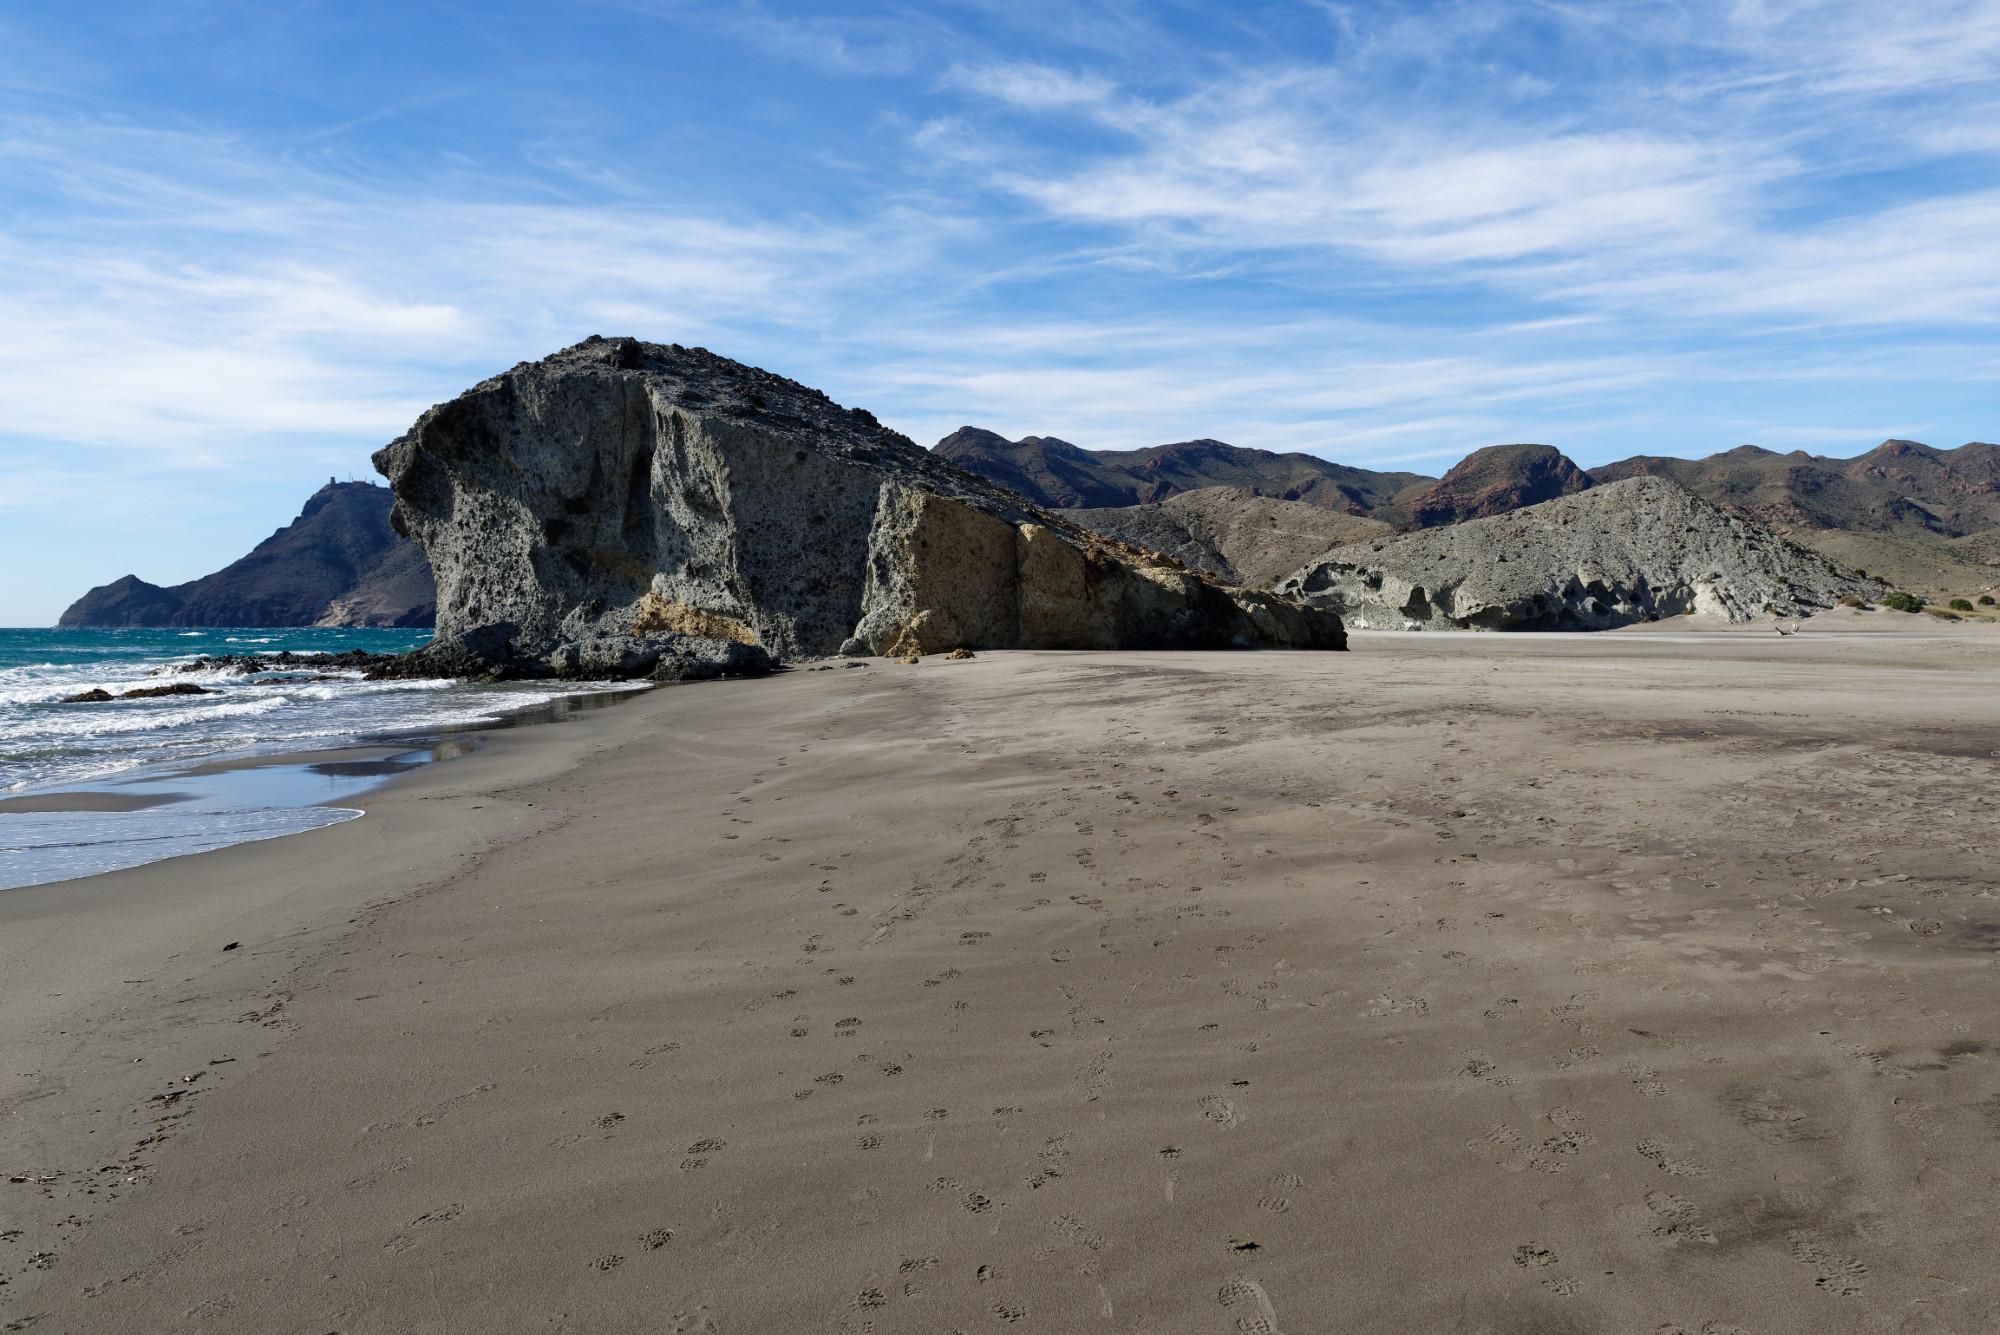 171214-San Jose-Playa del Monsul (Cabo de Gata-Andalousie) (186)